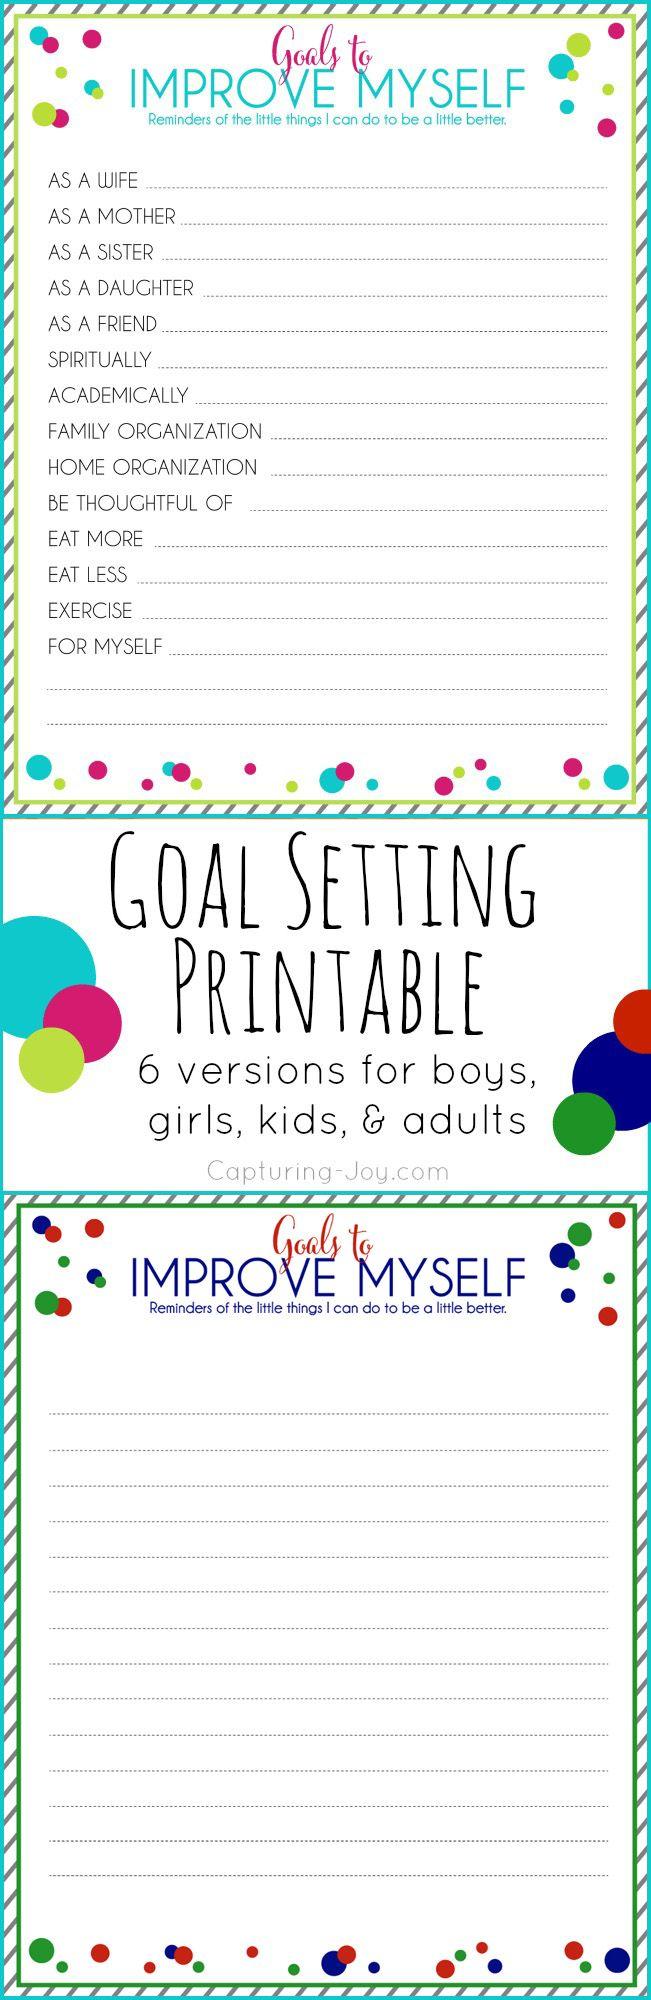 Goals To Improve Myself Free Printable